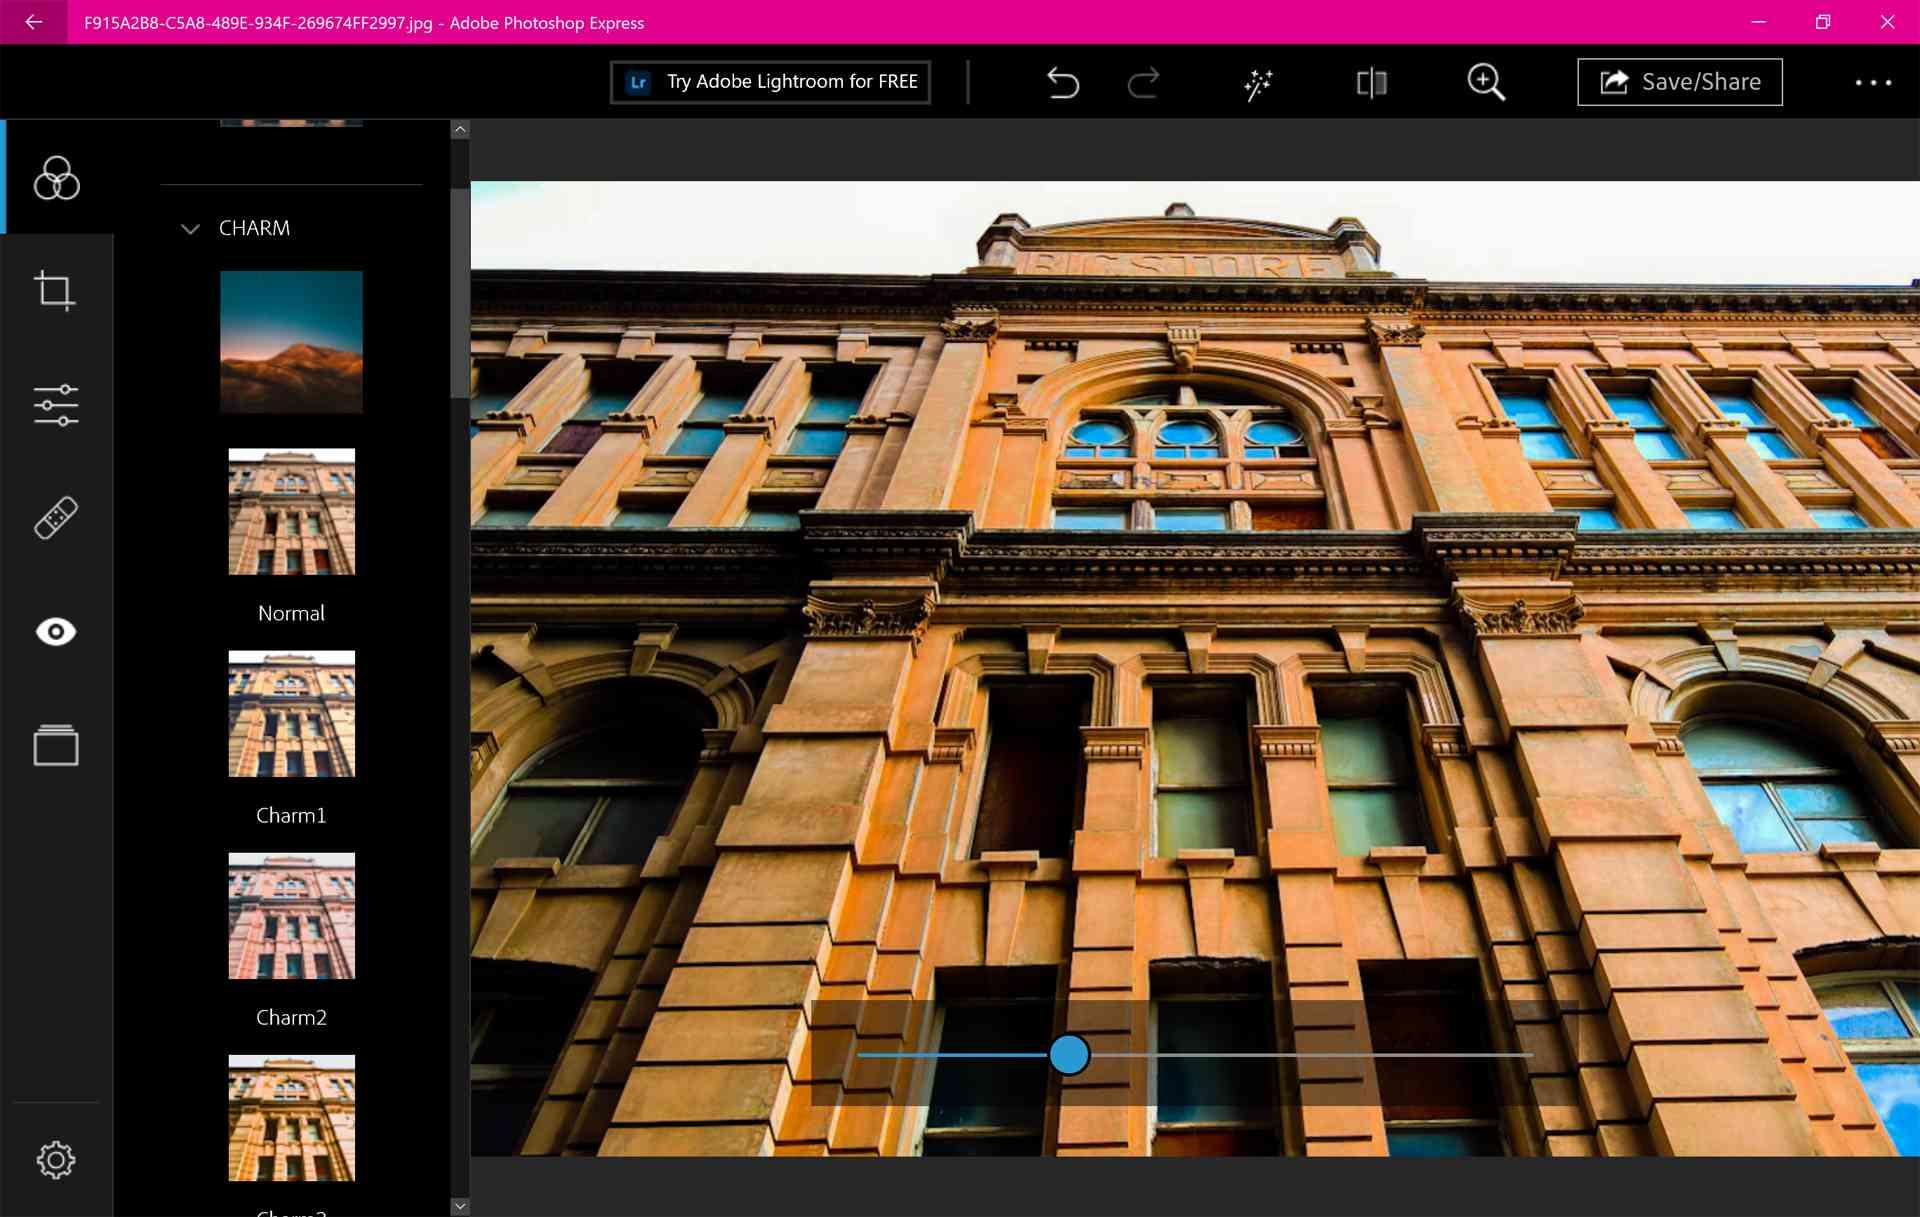 Windows 10 Photoshop Express app on Surface Pro 7.